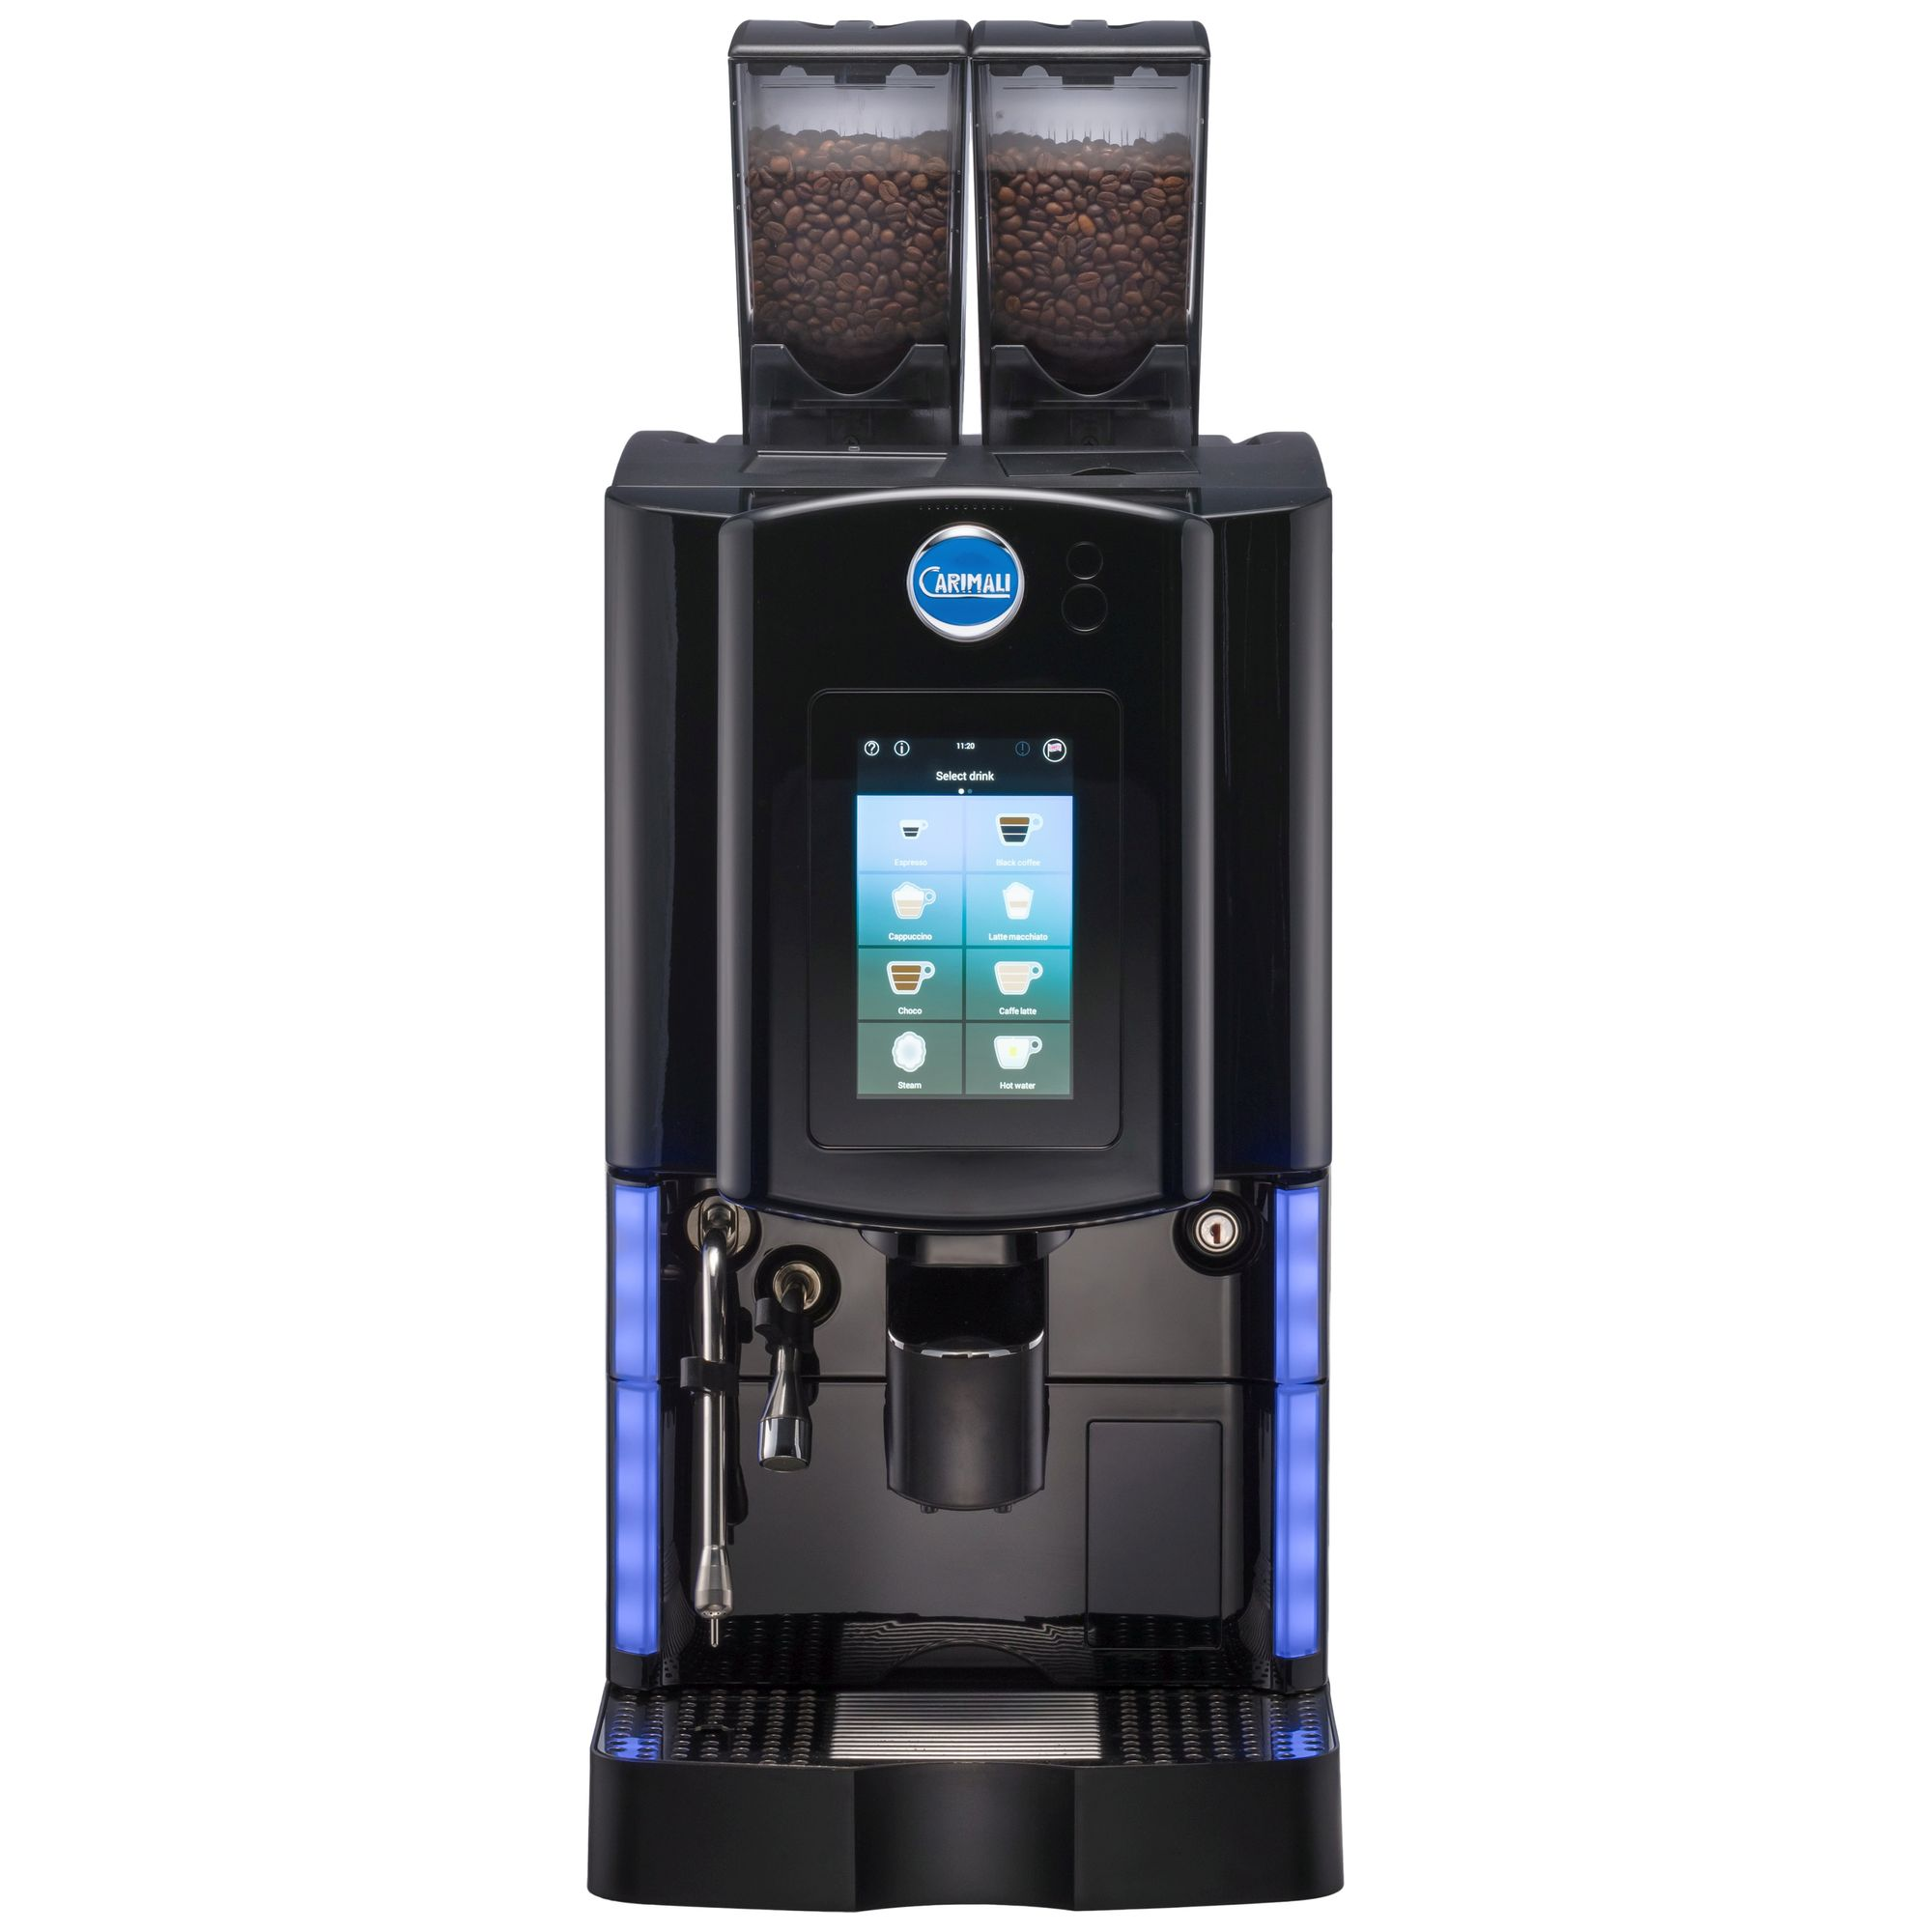 GF-Optima Bean To Cup Machine